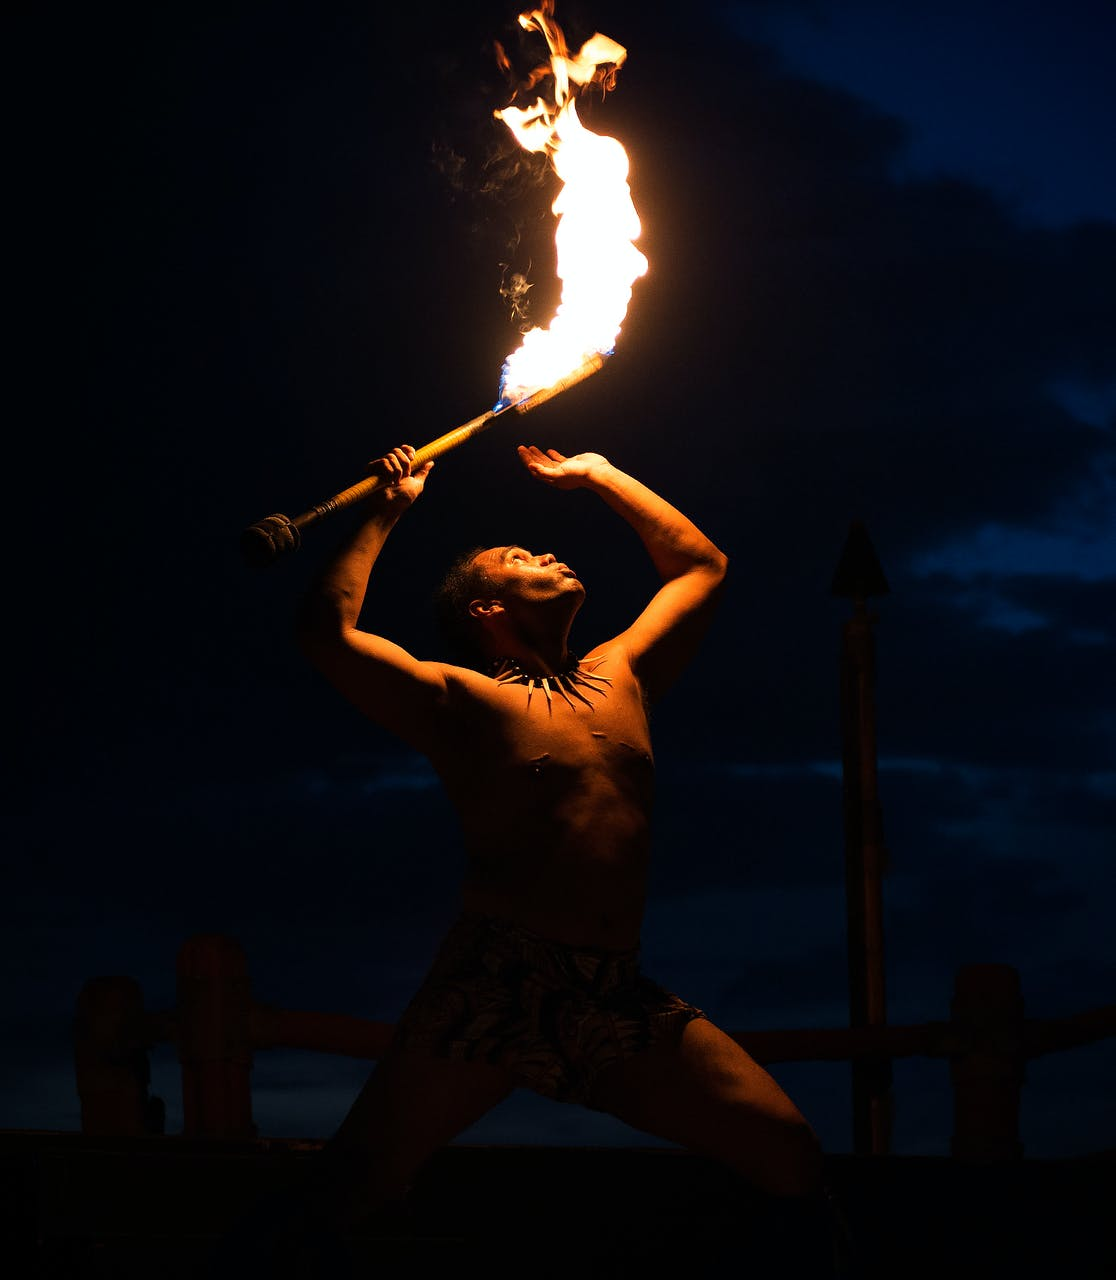 Fire Dance - Maui. Image courtesy of Kent Buckingham